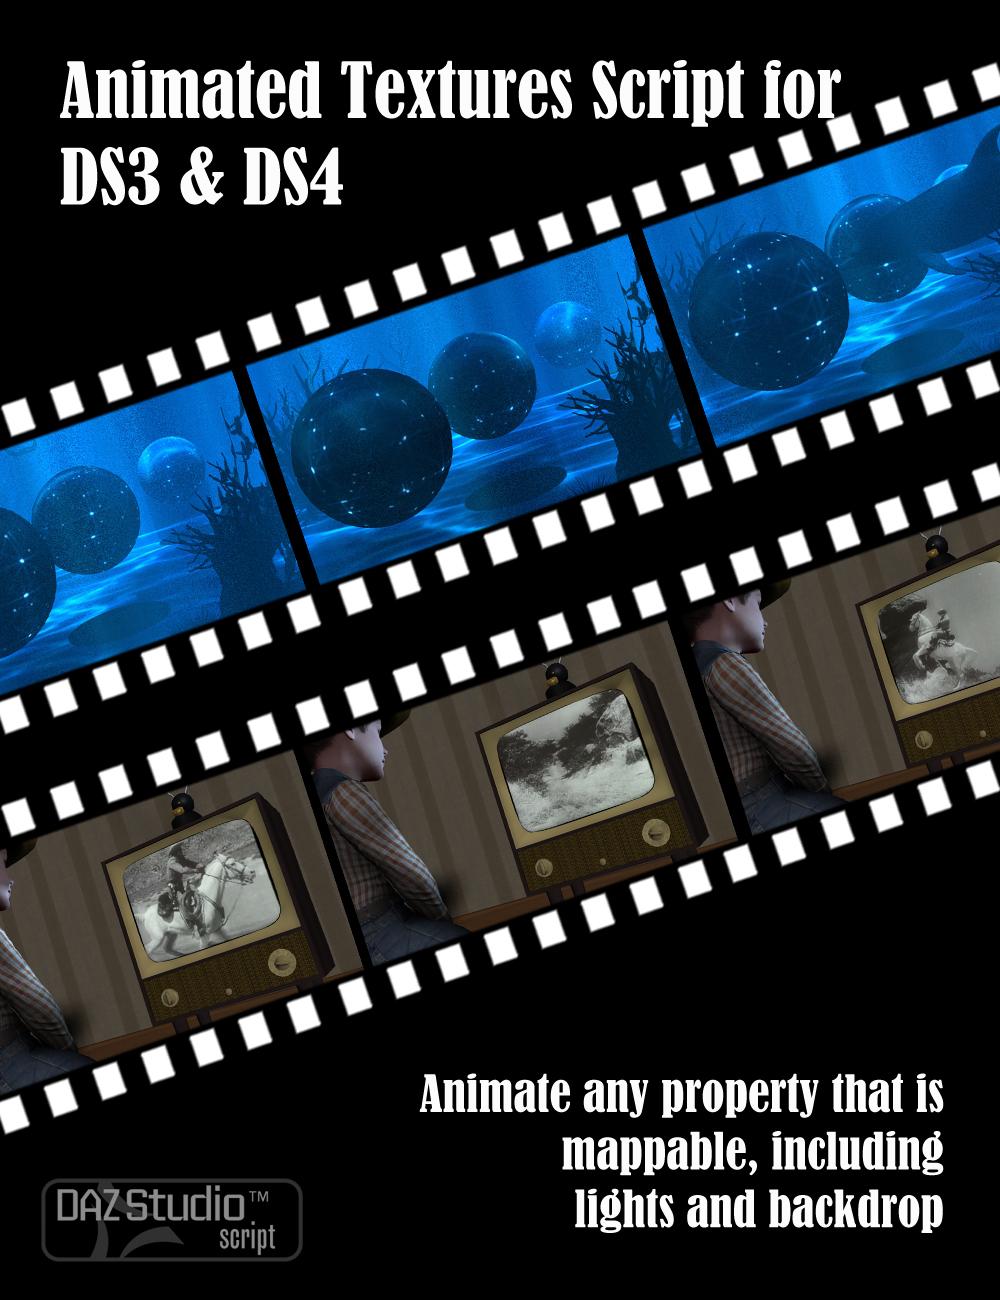 Animated Textures Script for DAZ Studio by: DraagonStorm, 3D Models by Daz 3D